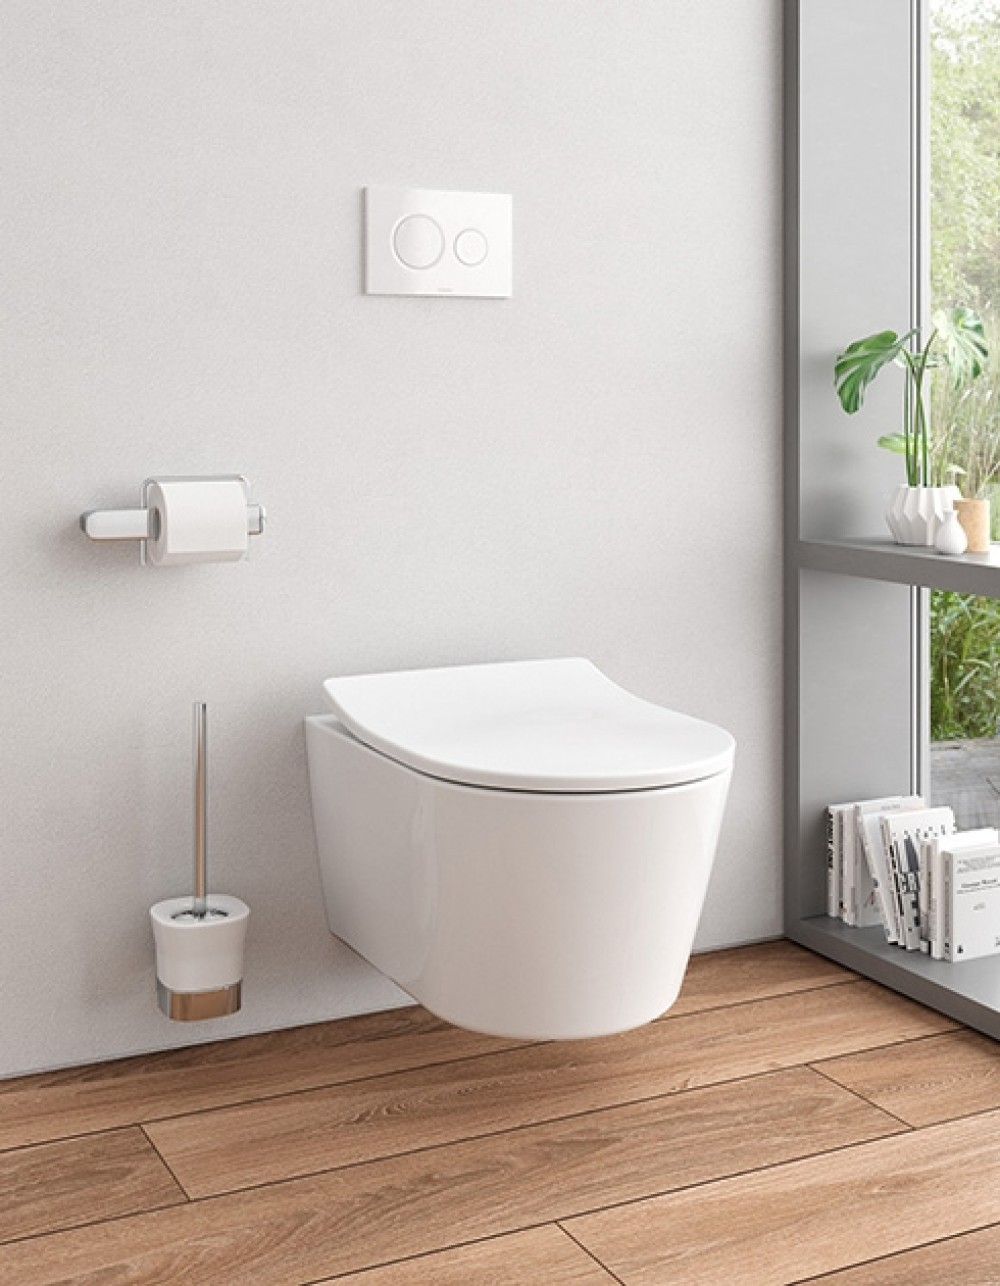 toto wc toilett cw552y toto rp